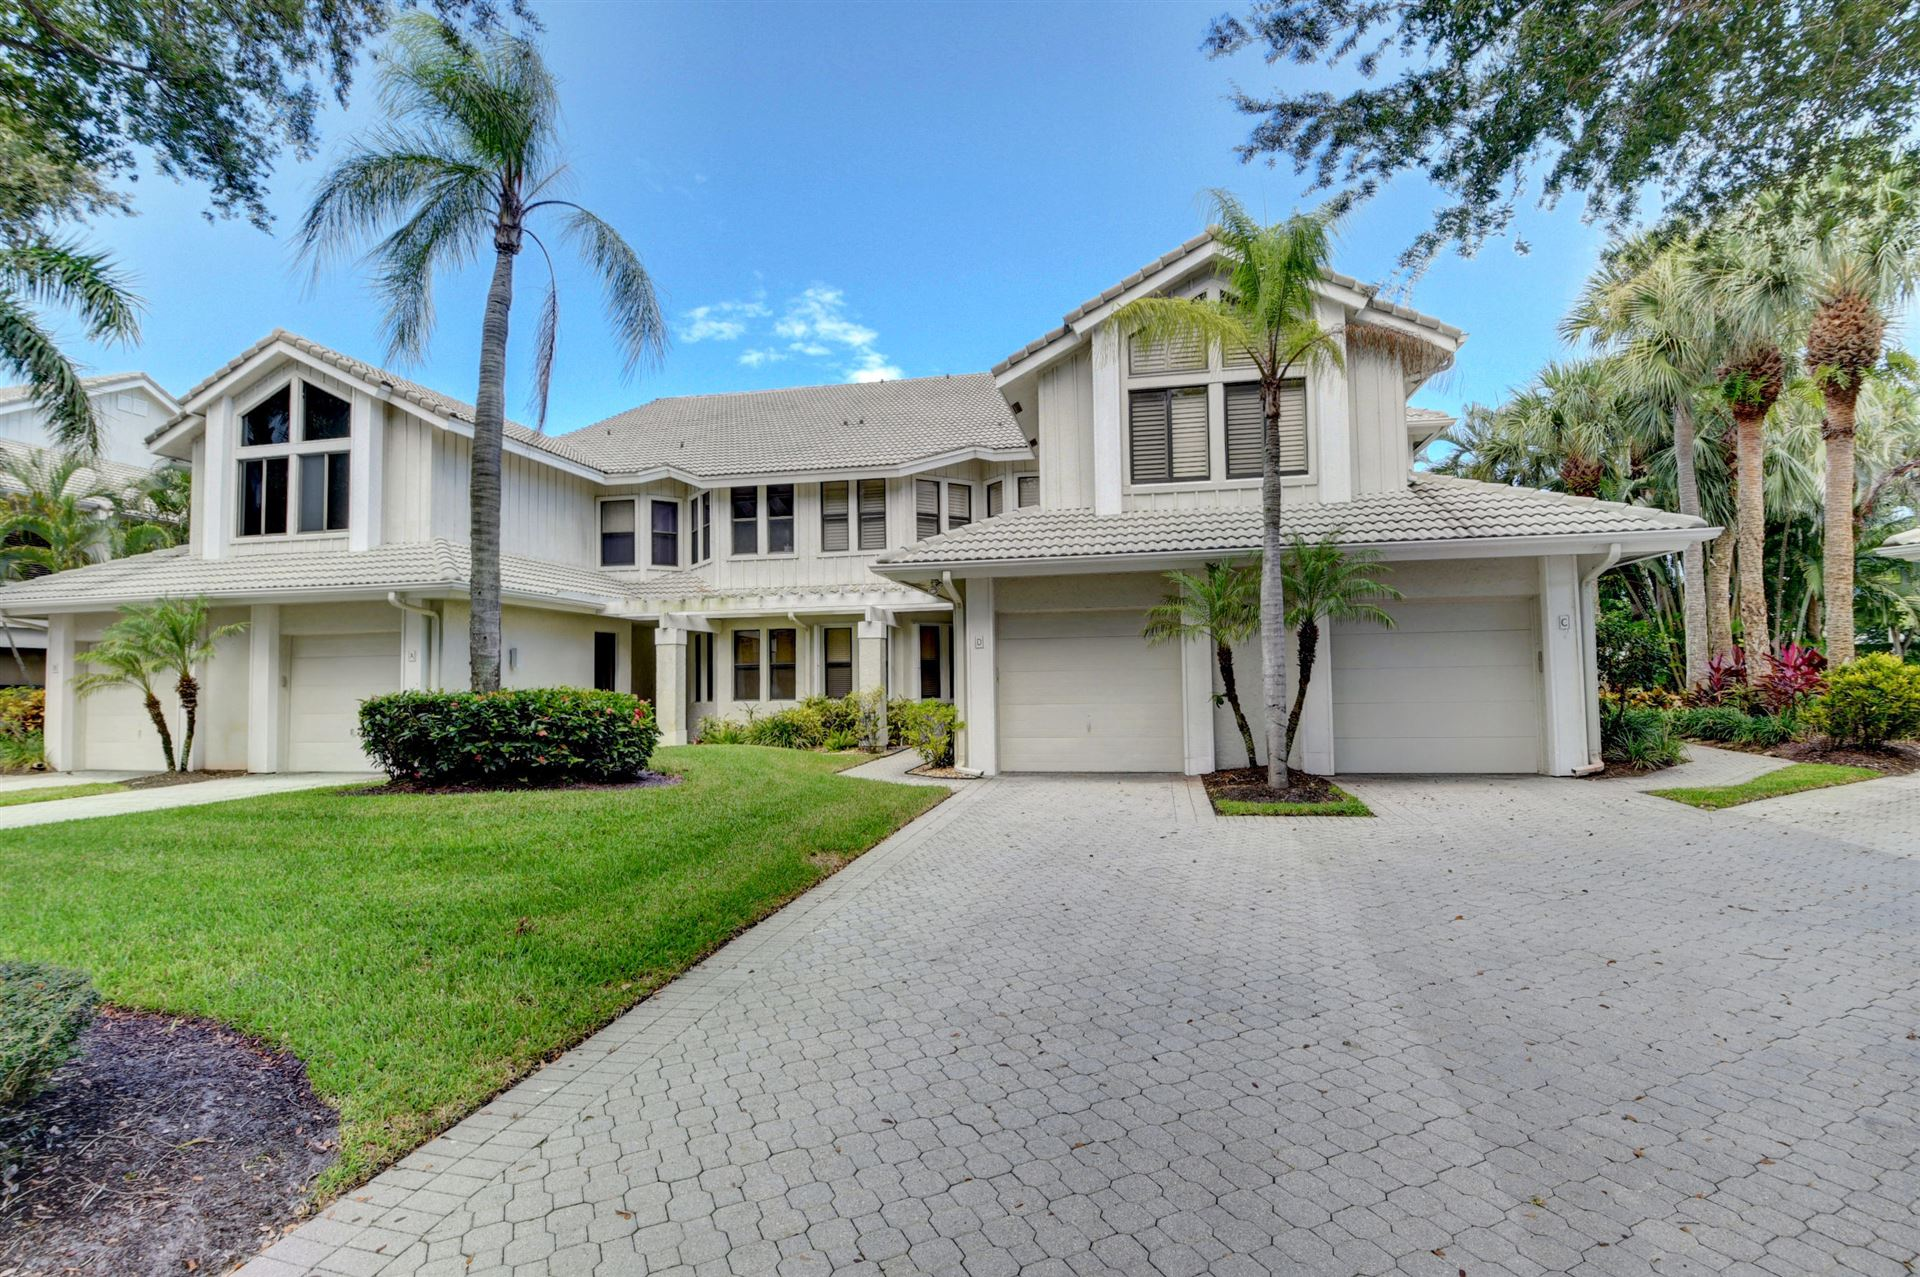 17644 Ashbourne Way #C, Boca Raton, FL 33496 - #: RX-10629837